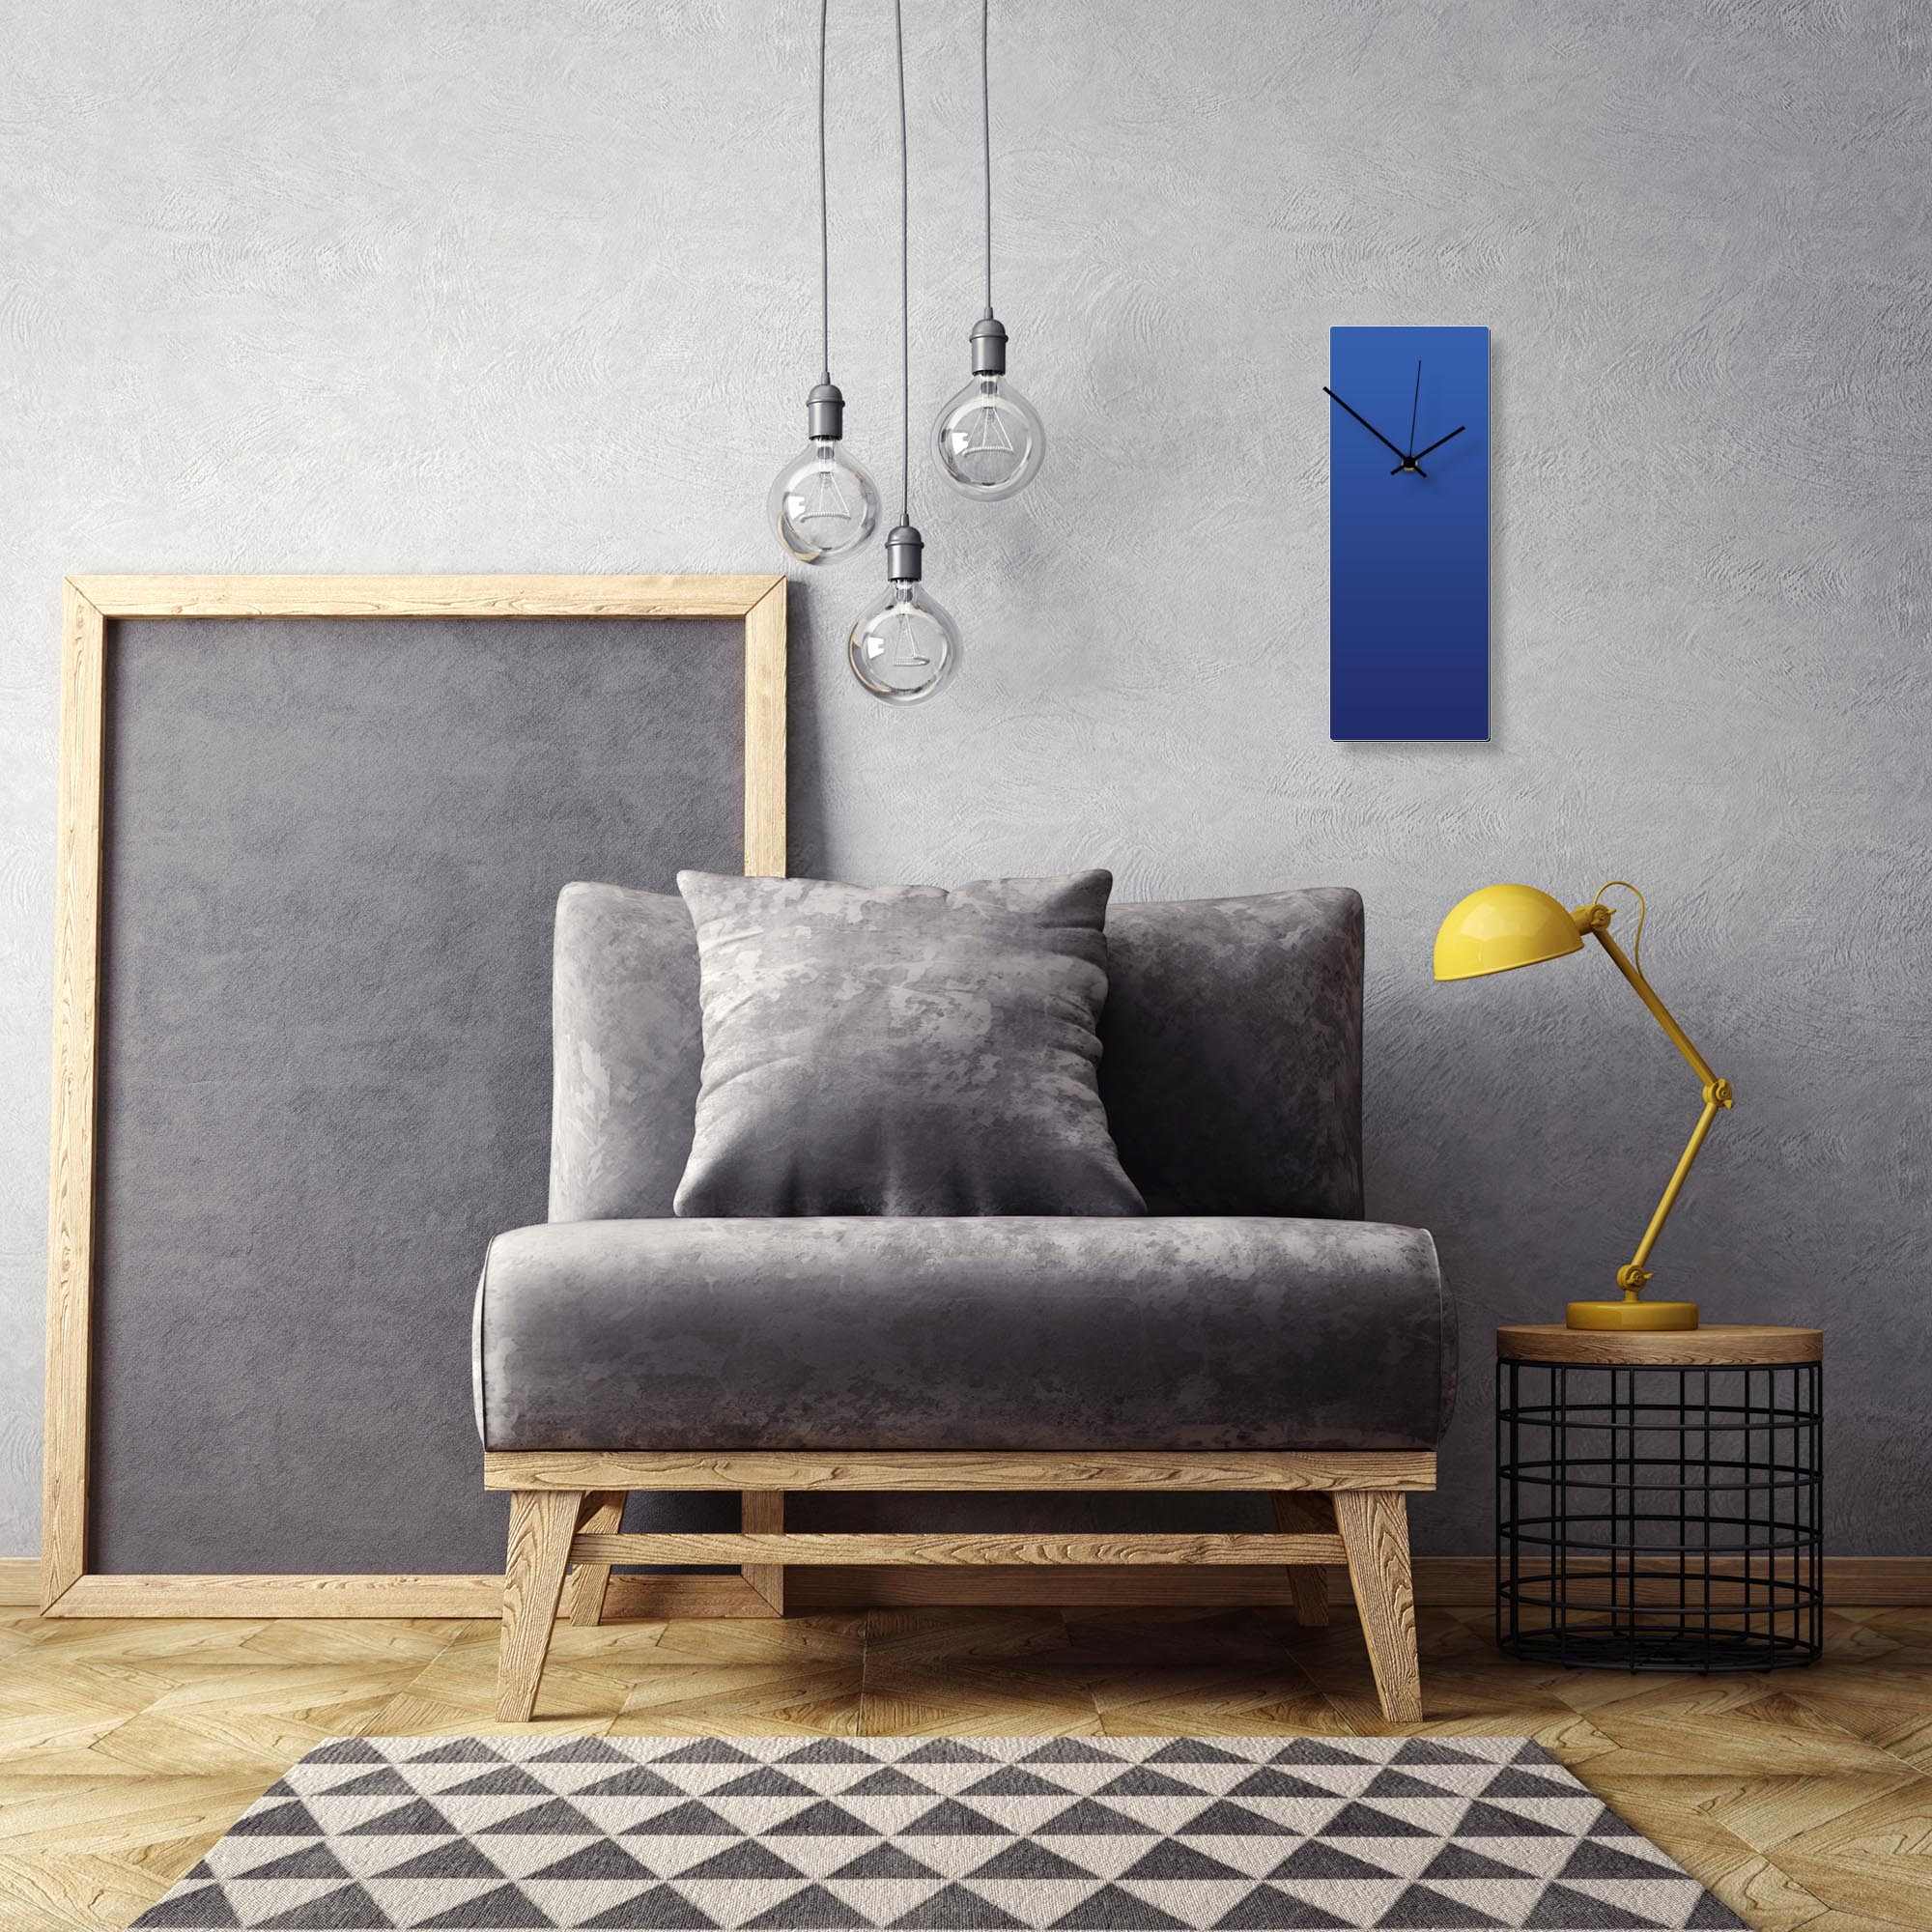 Blueout Black Clock by Adam Schwoeppe Contemporary Clock on Aluminum Polymetal - Alternate View 1